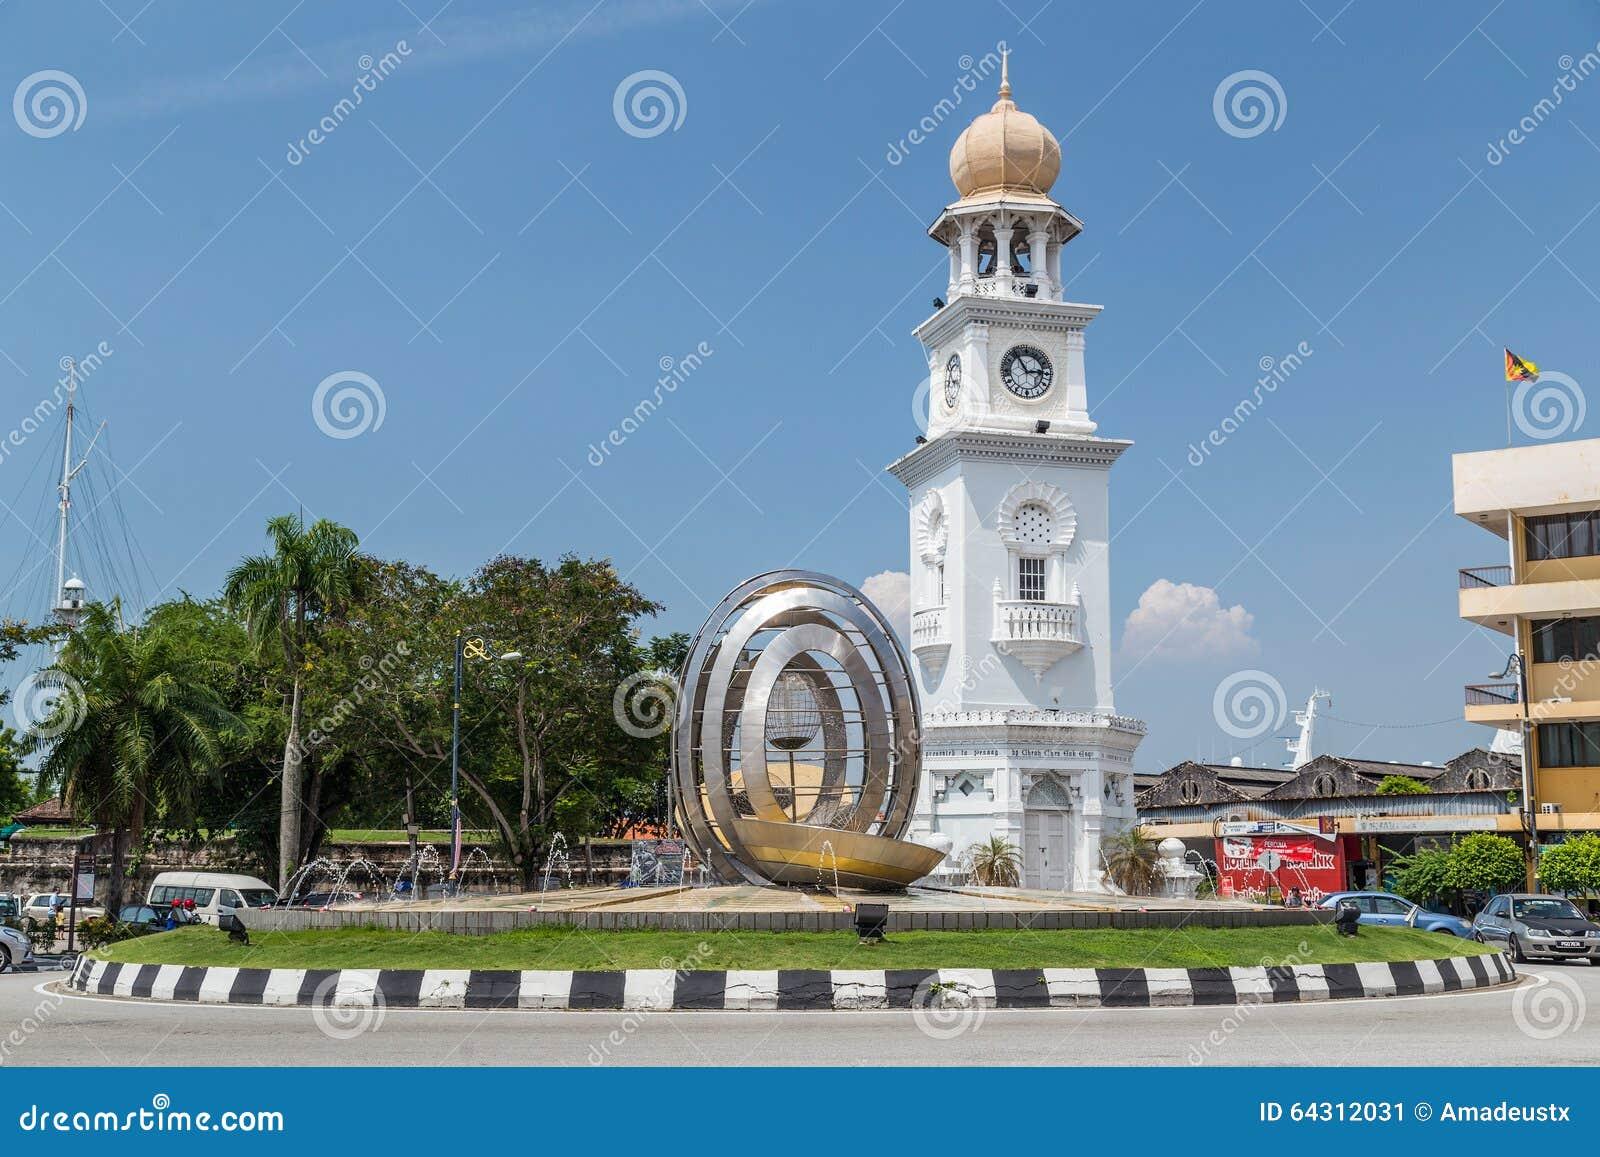 Georgetown, Penang/Malesia - circa ottobre 2015: Regina Victoria Memorial Clocktower a Georgetown, Penang, Malesia